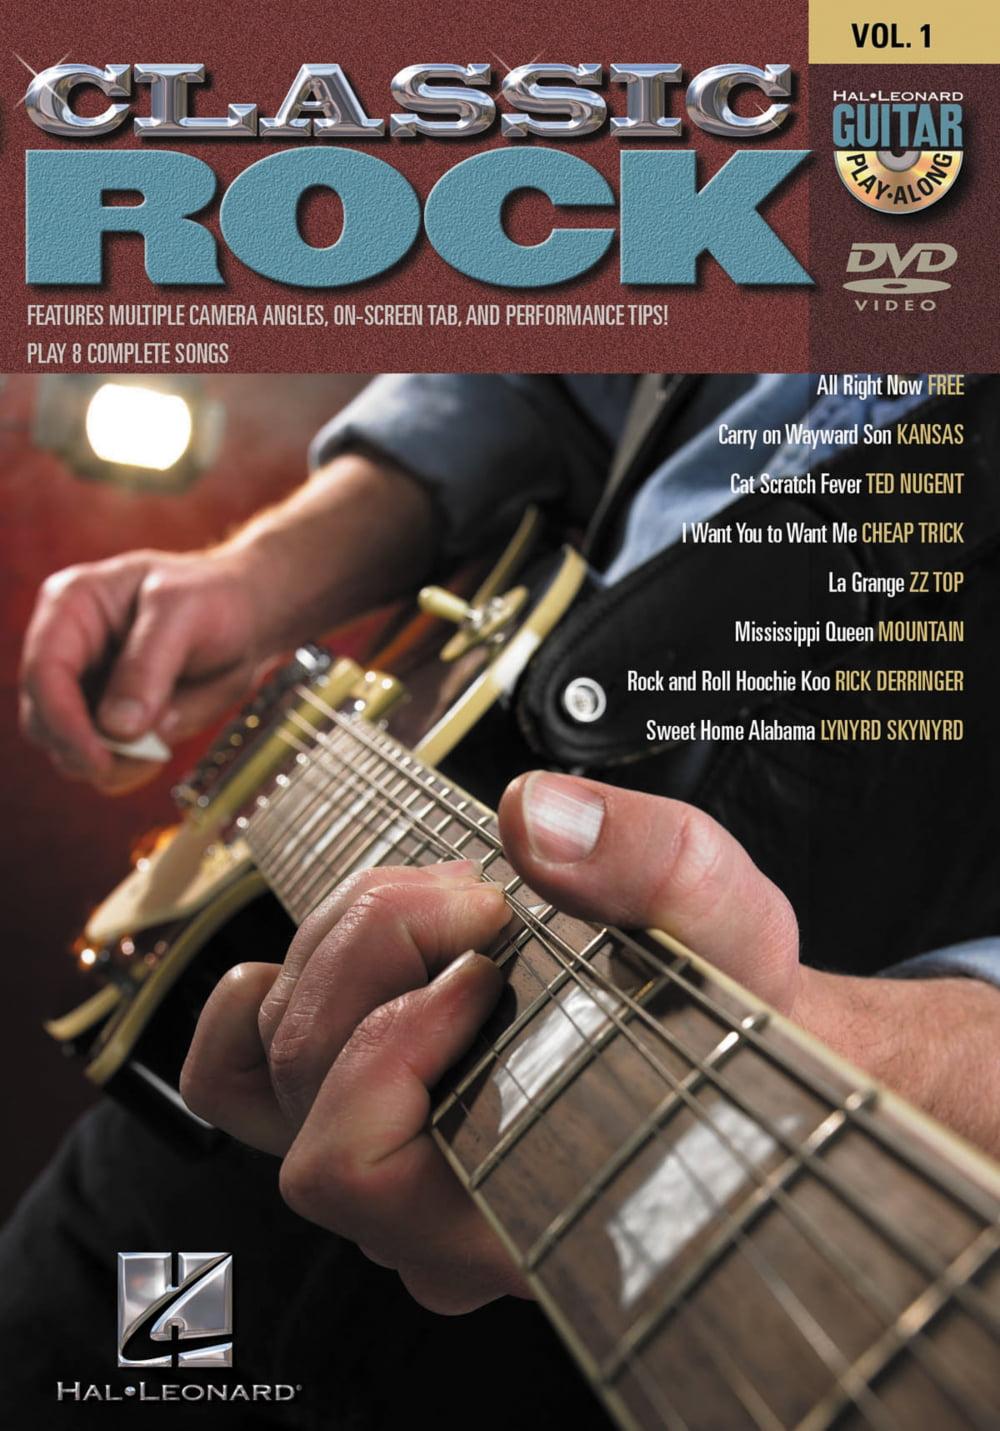 Hal Leonard Classic Rock Guitar Play-Along DVD Series Volume 1 by Hal Leonard Corporation